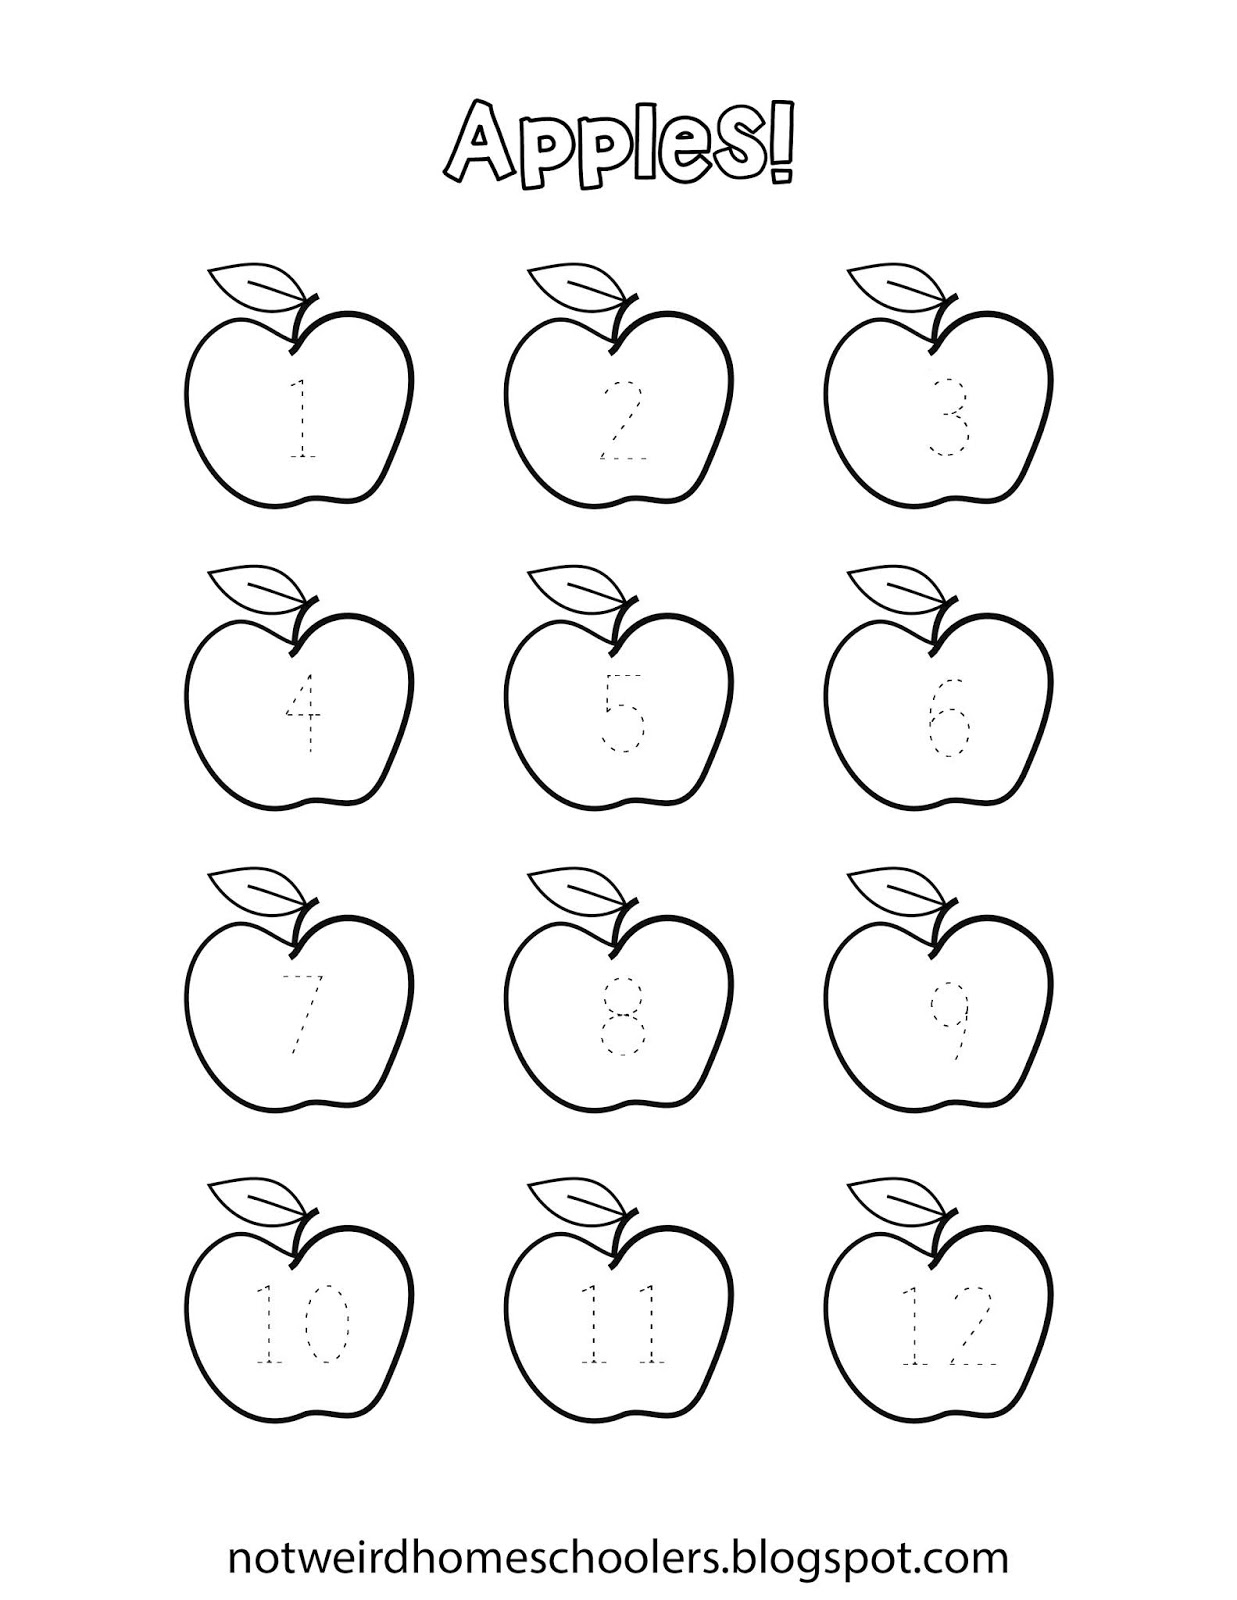 Free Homeschooling Resource Number Tracing Worksheet